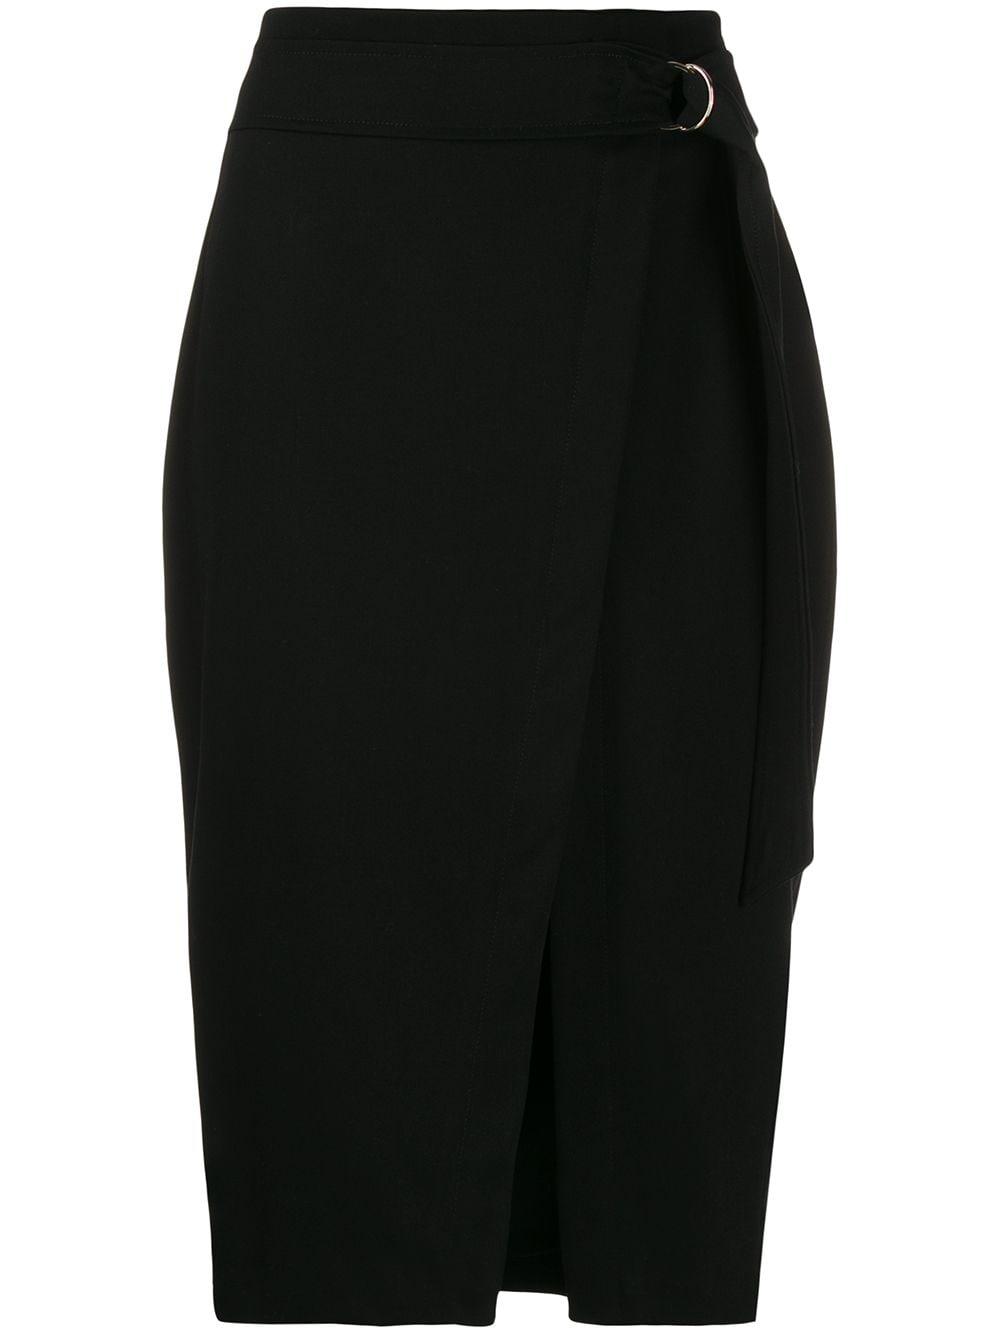 LIU JO belted pencil skirt